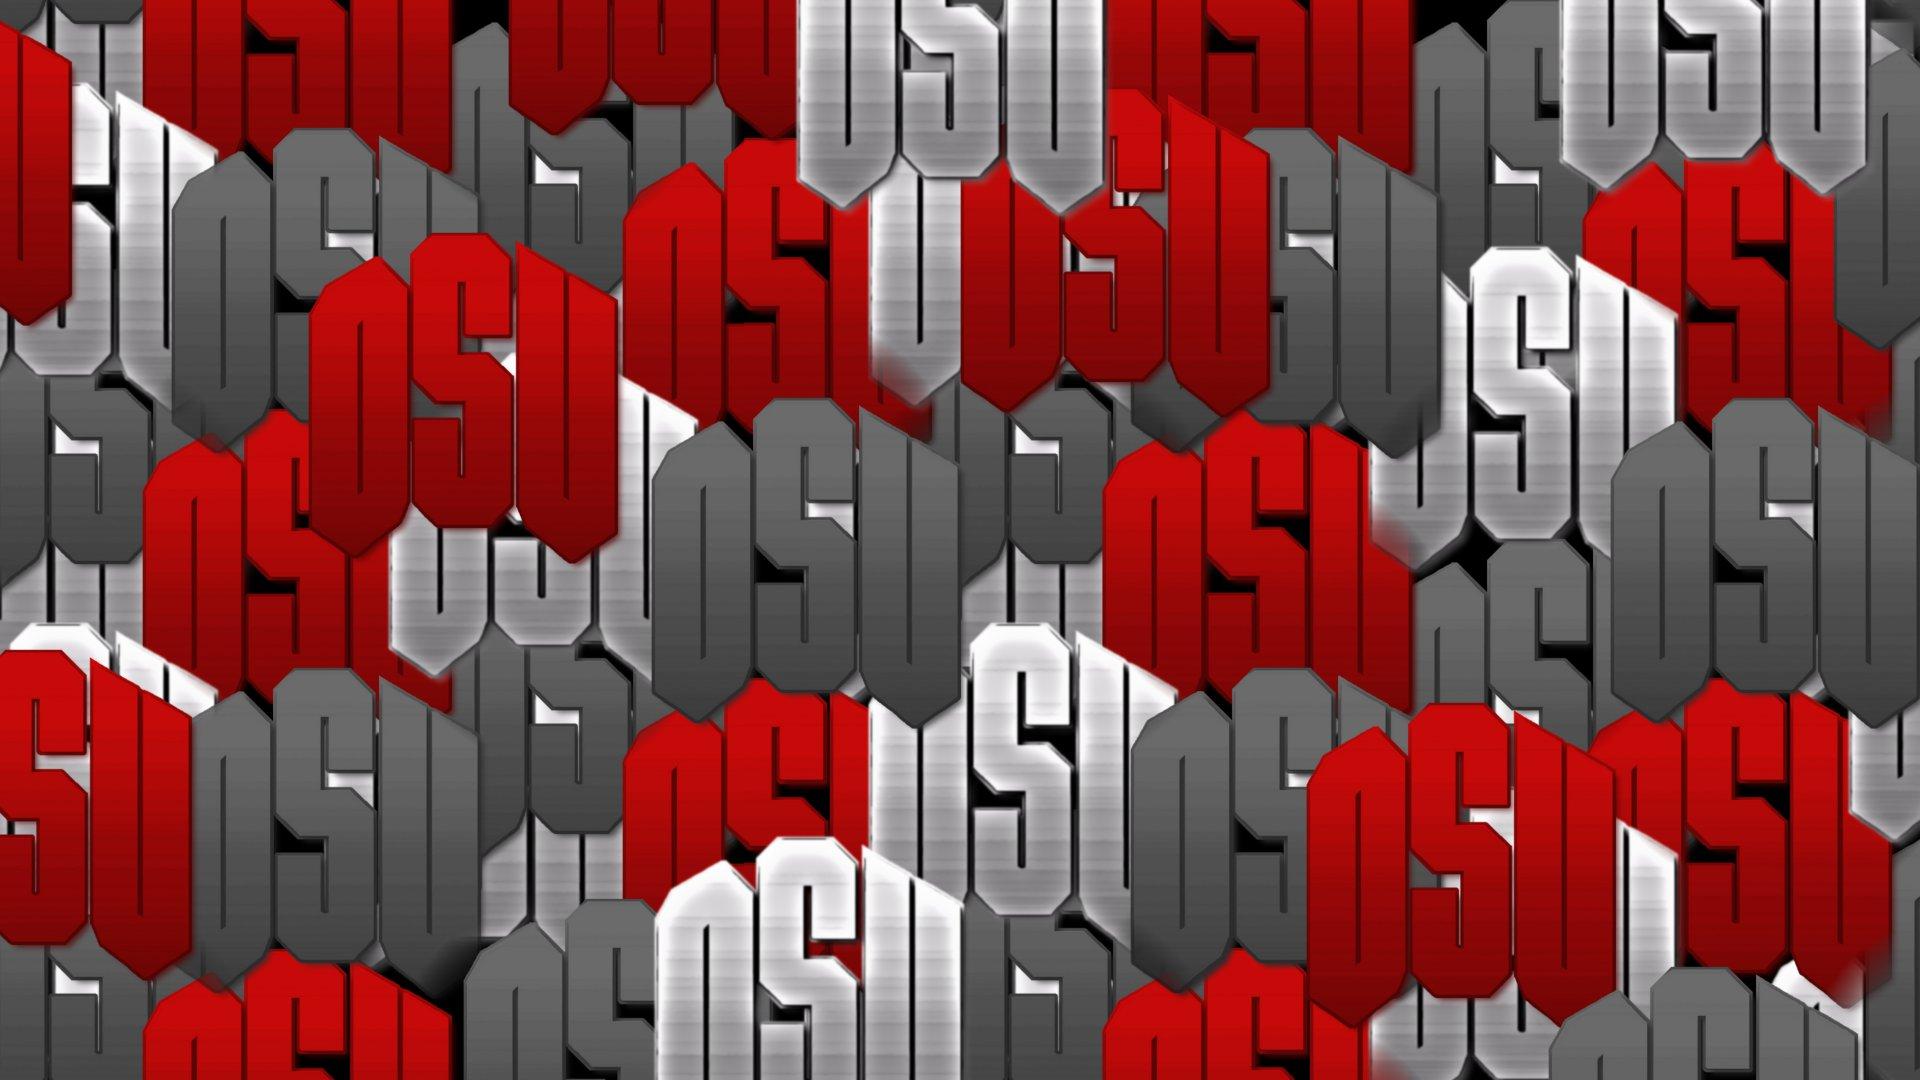 ohio state buckeyes wallpaper hd